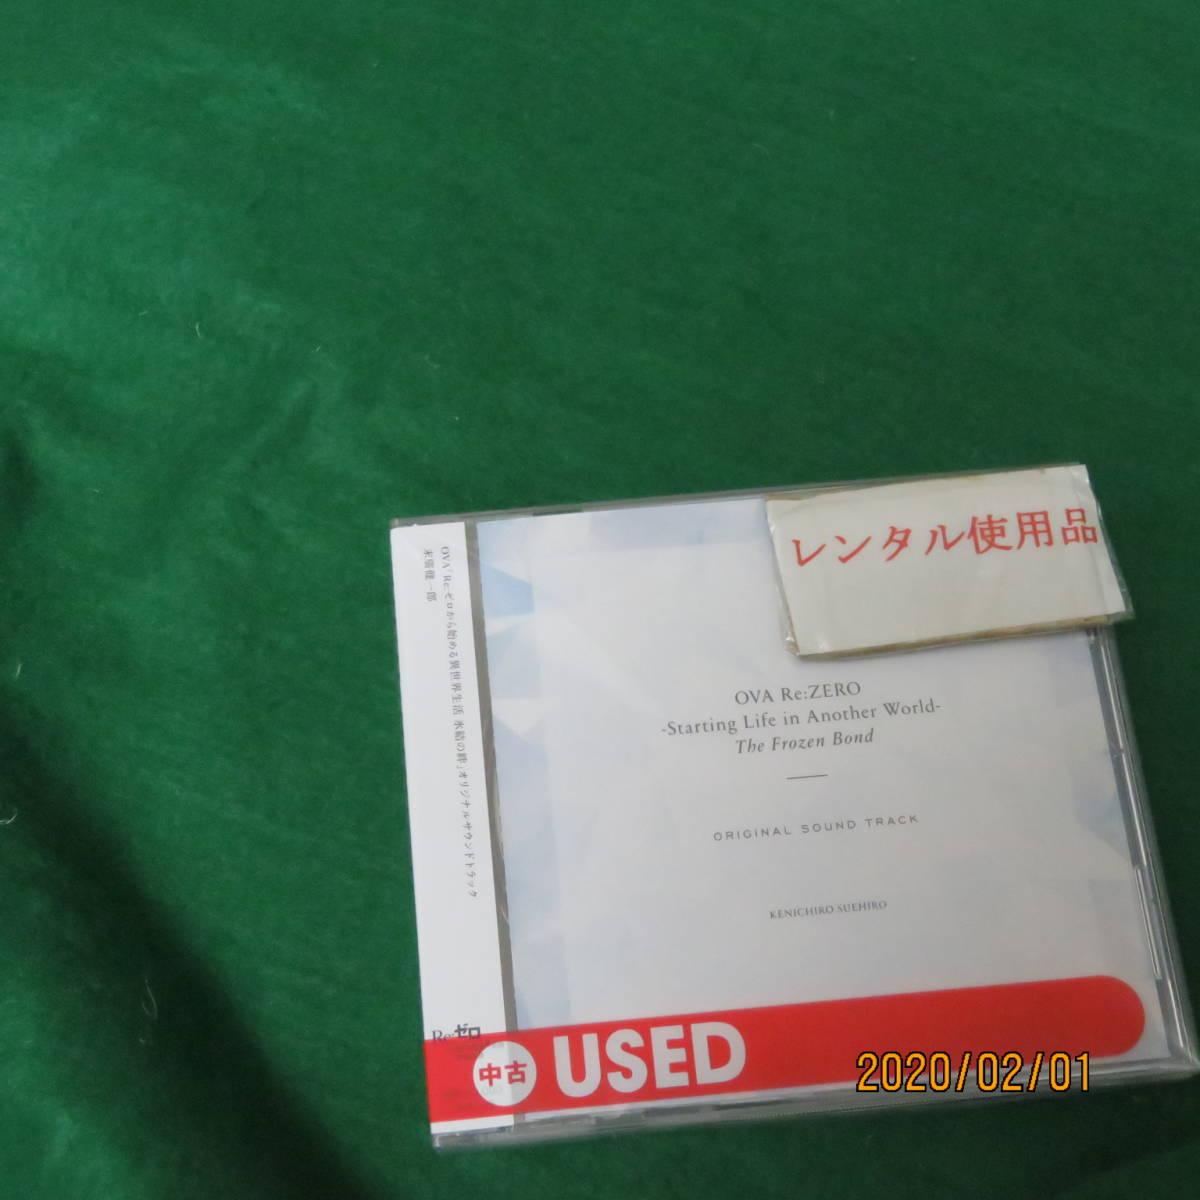 OVA「 Re:ゼロから始める異世界生活 氷結の絆 」オリジナルサウンドトラック サウンドトラック 末廣健一郎 形式: CD_画像1